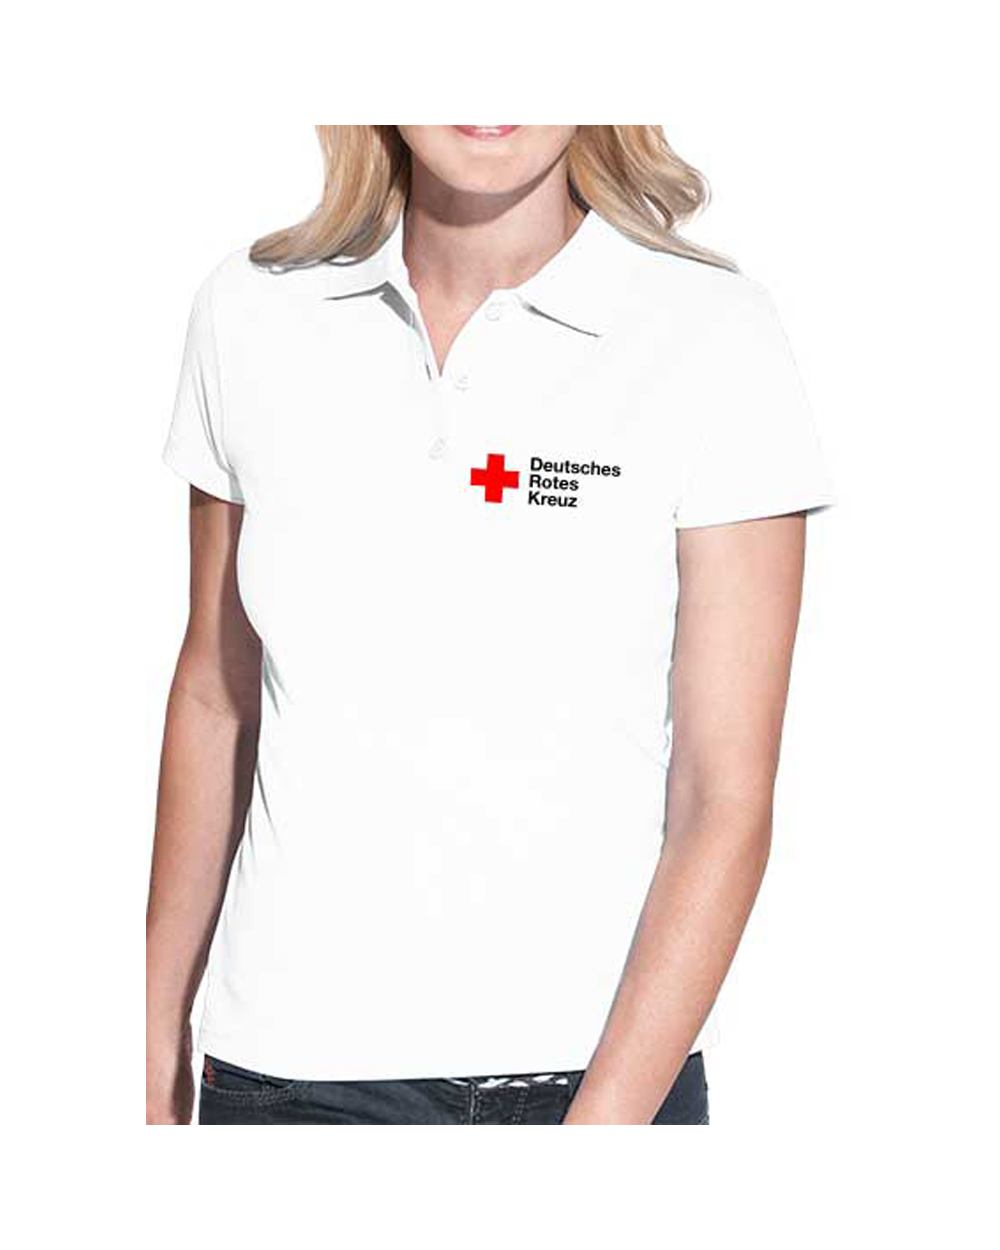 Poloshirt Lady weiß mit DRK Kompaktlogo